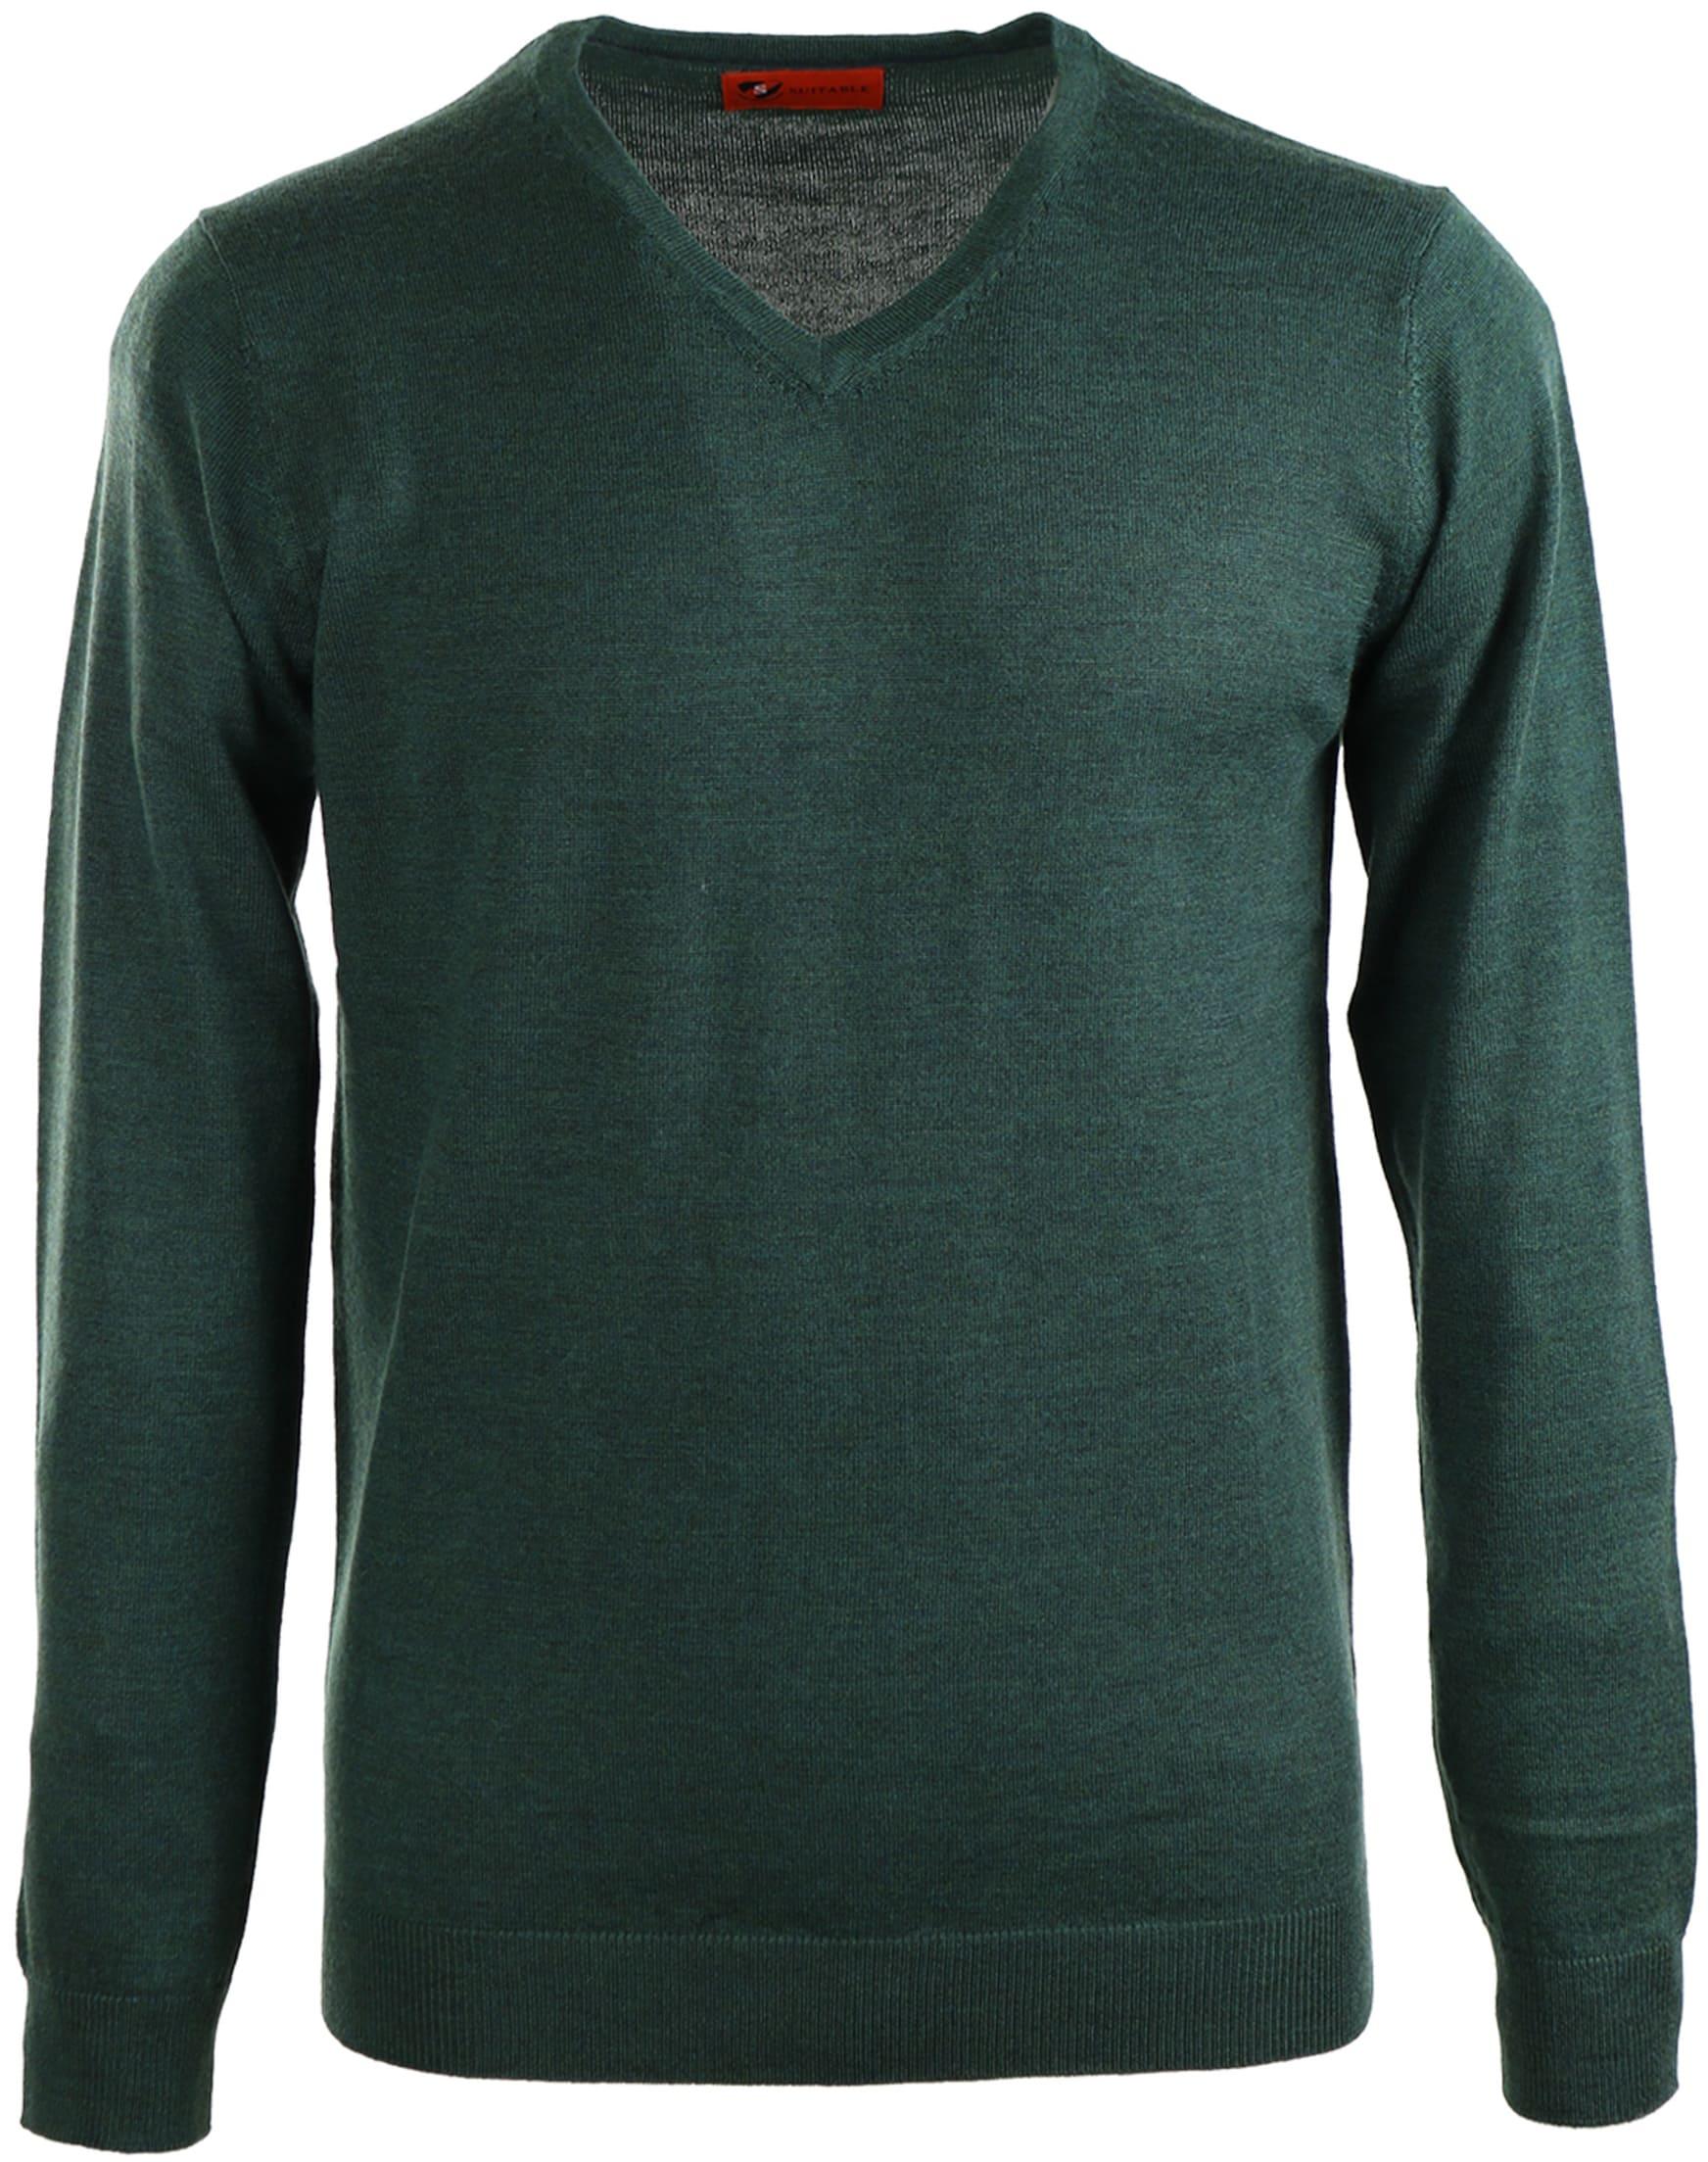 Suitable Pullover Merino Wol Groen foto 0